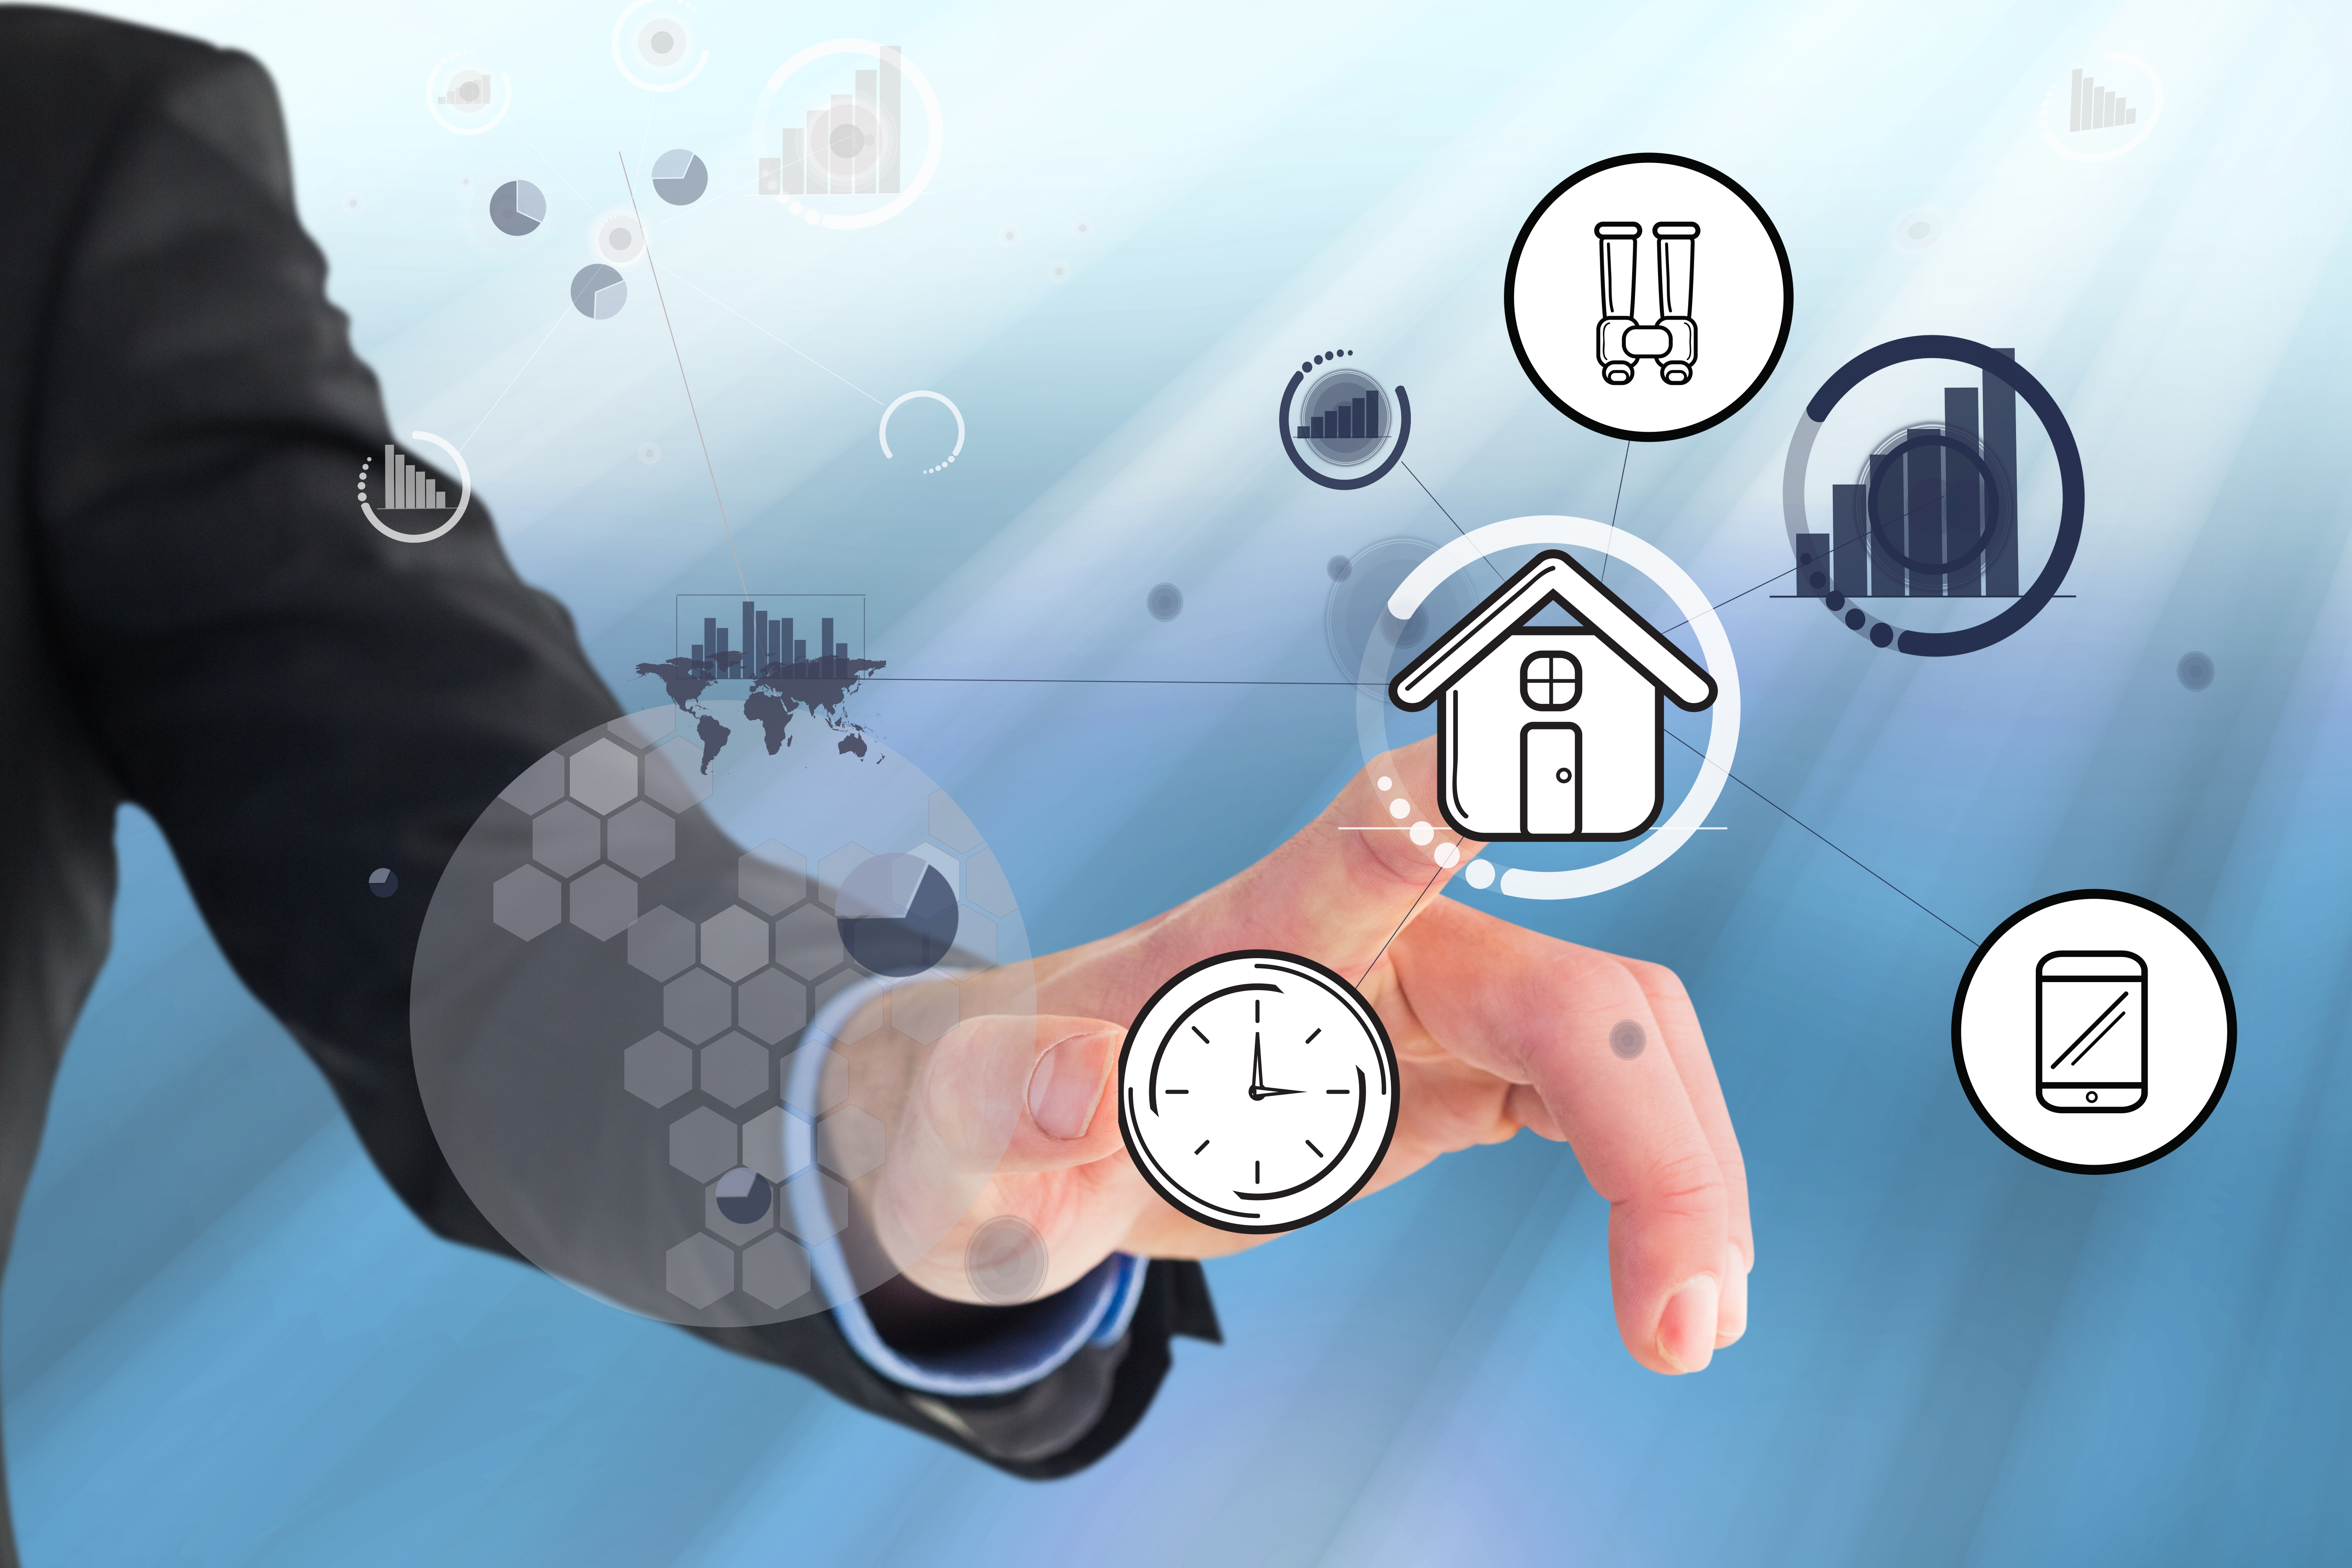 Blue Duck采用专属的FPX自动扣款系统,以及自动索赔程序能够减轻房东的担忧。-图摘自Freepik-